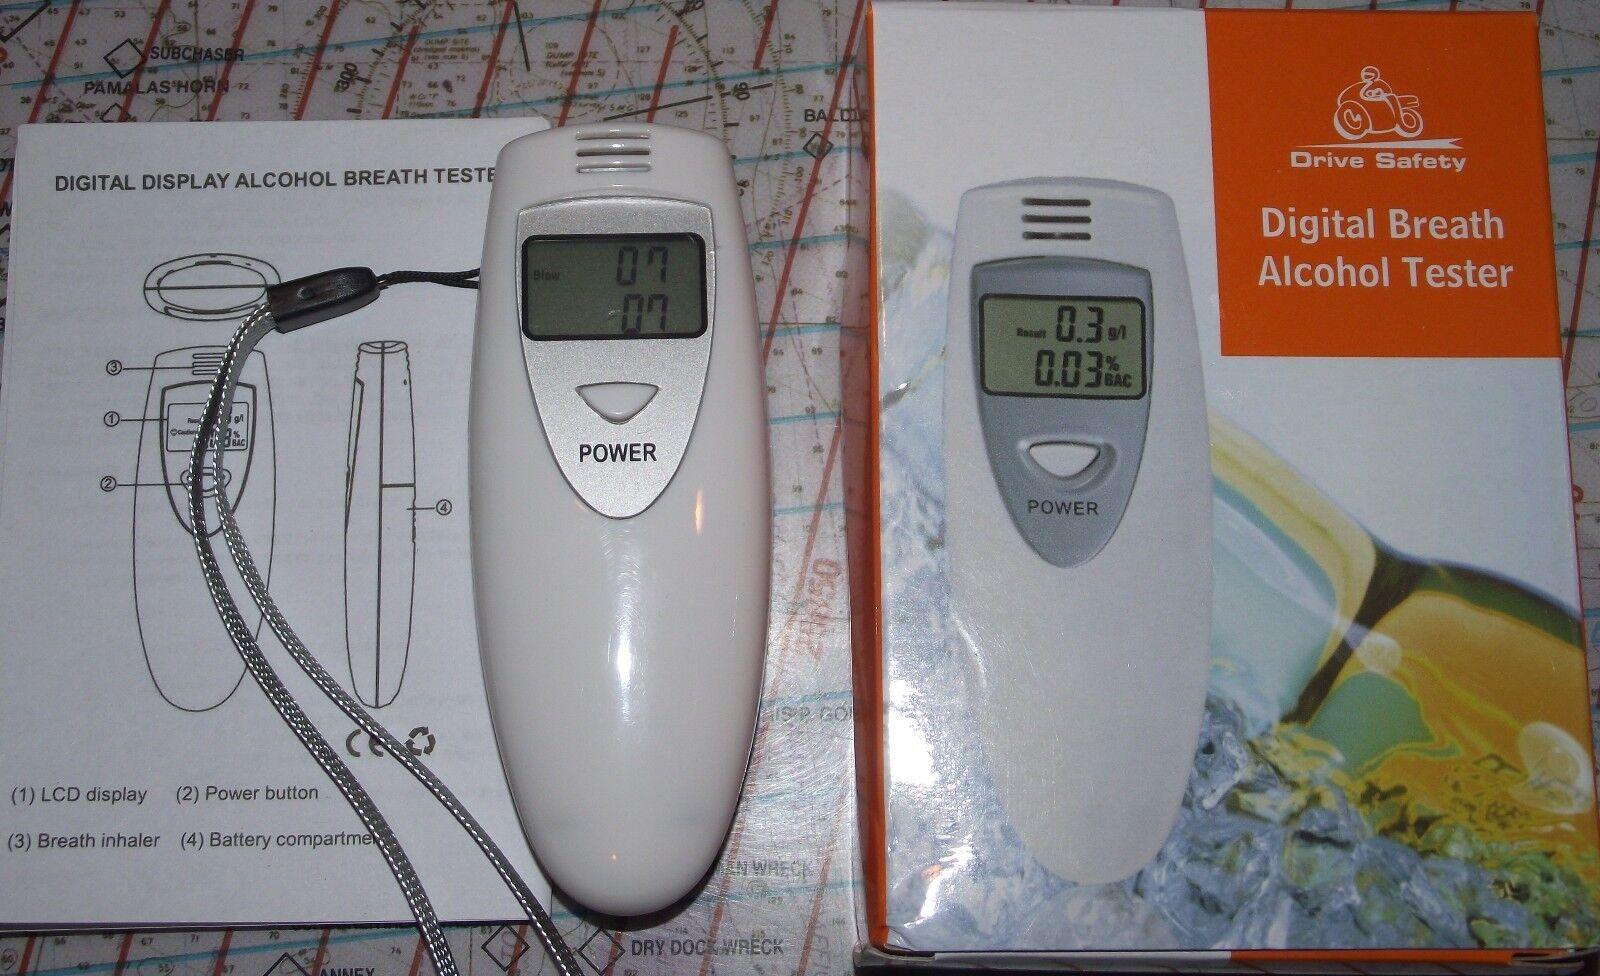 DIGITAL ALCOHOL BREATH TESTER - BREATHALYZER - ALCOHOL DETECTOR - LCD DISPLAY